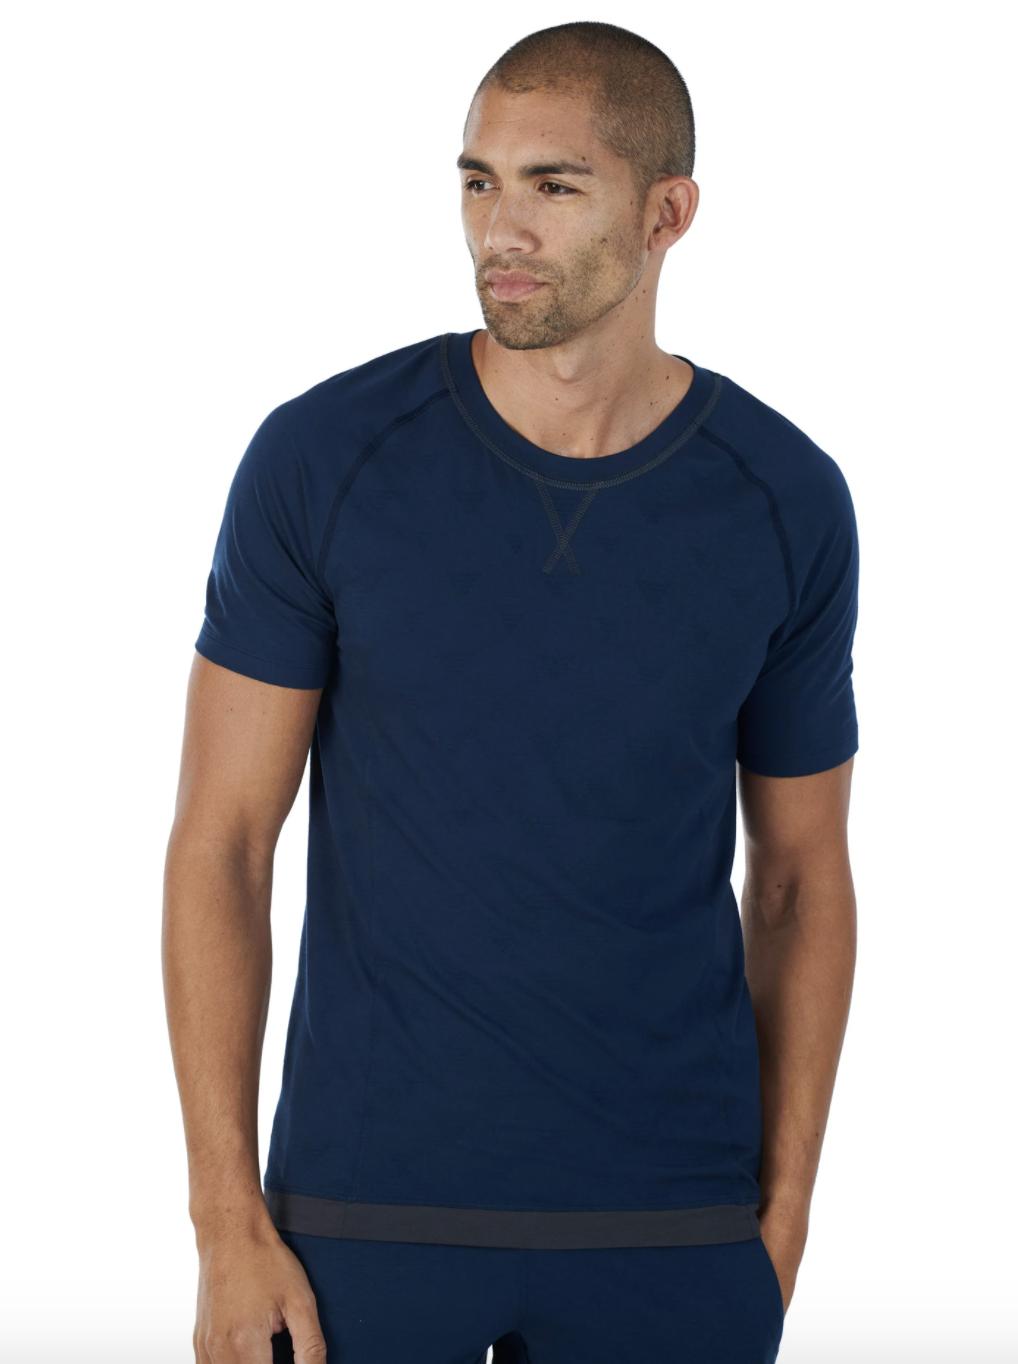 Model wearing the sleep shirt